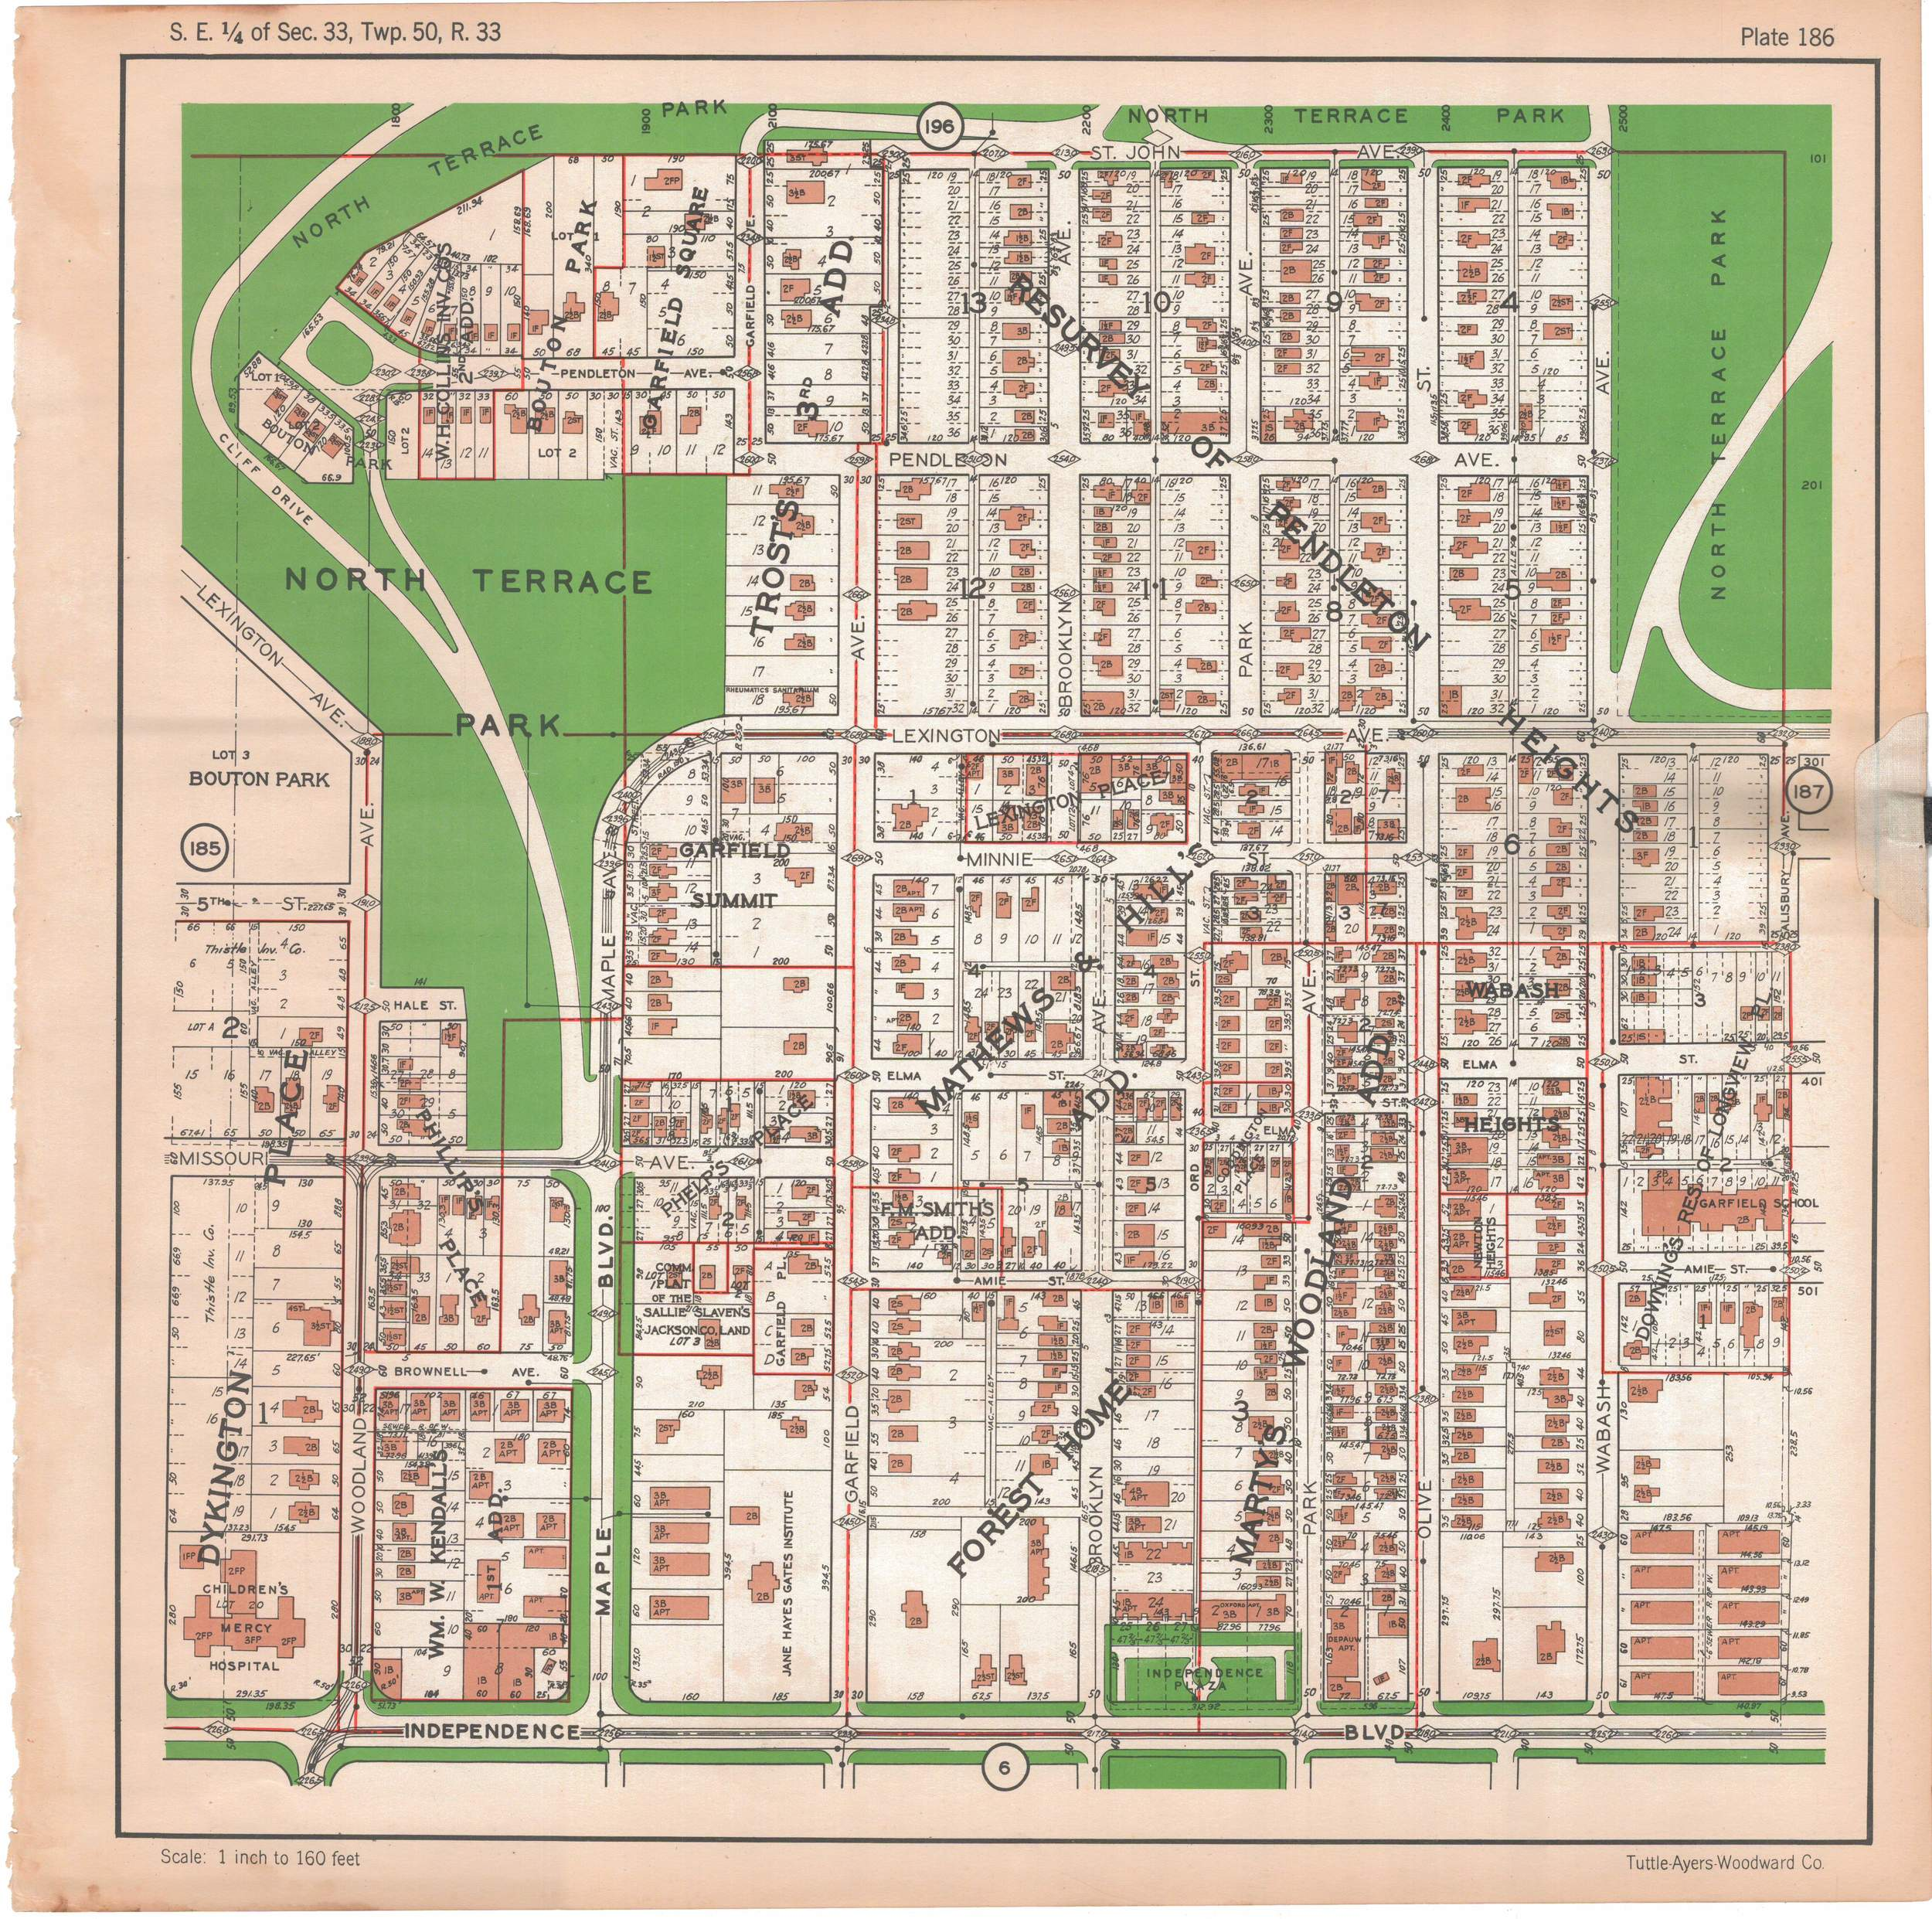 1925 TUTTLE_AYERS_Plate_186.JPG